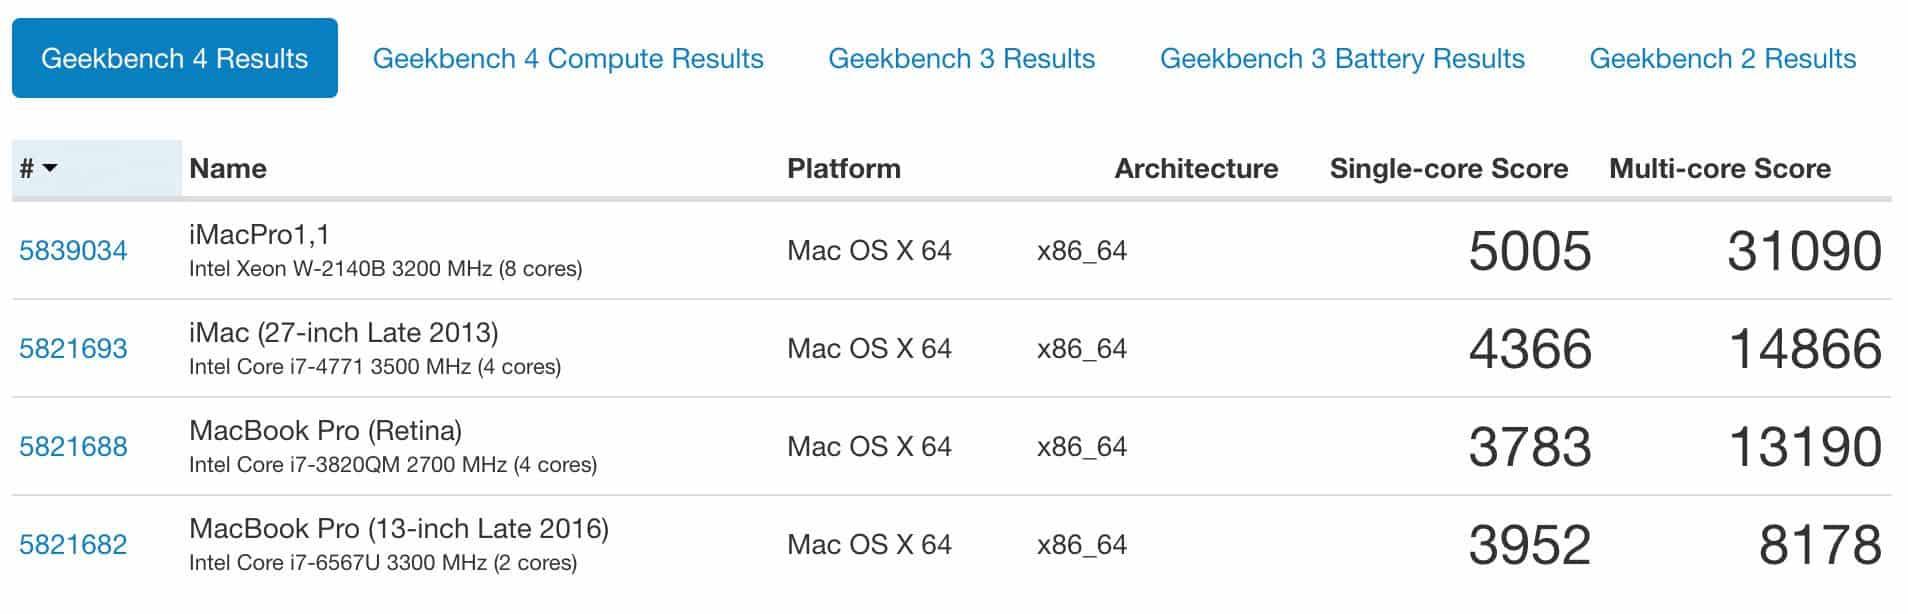 Geekbench CPU Results